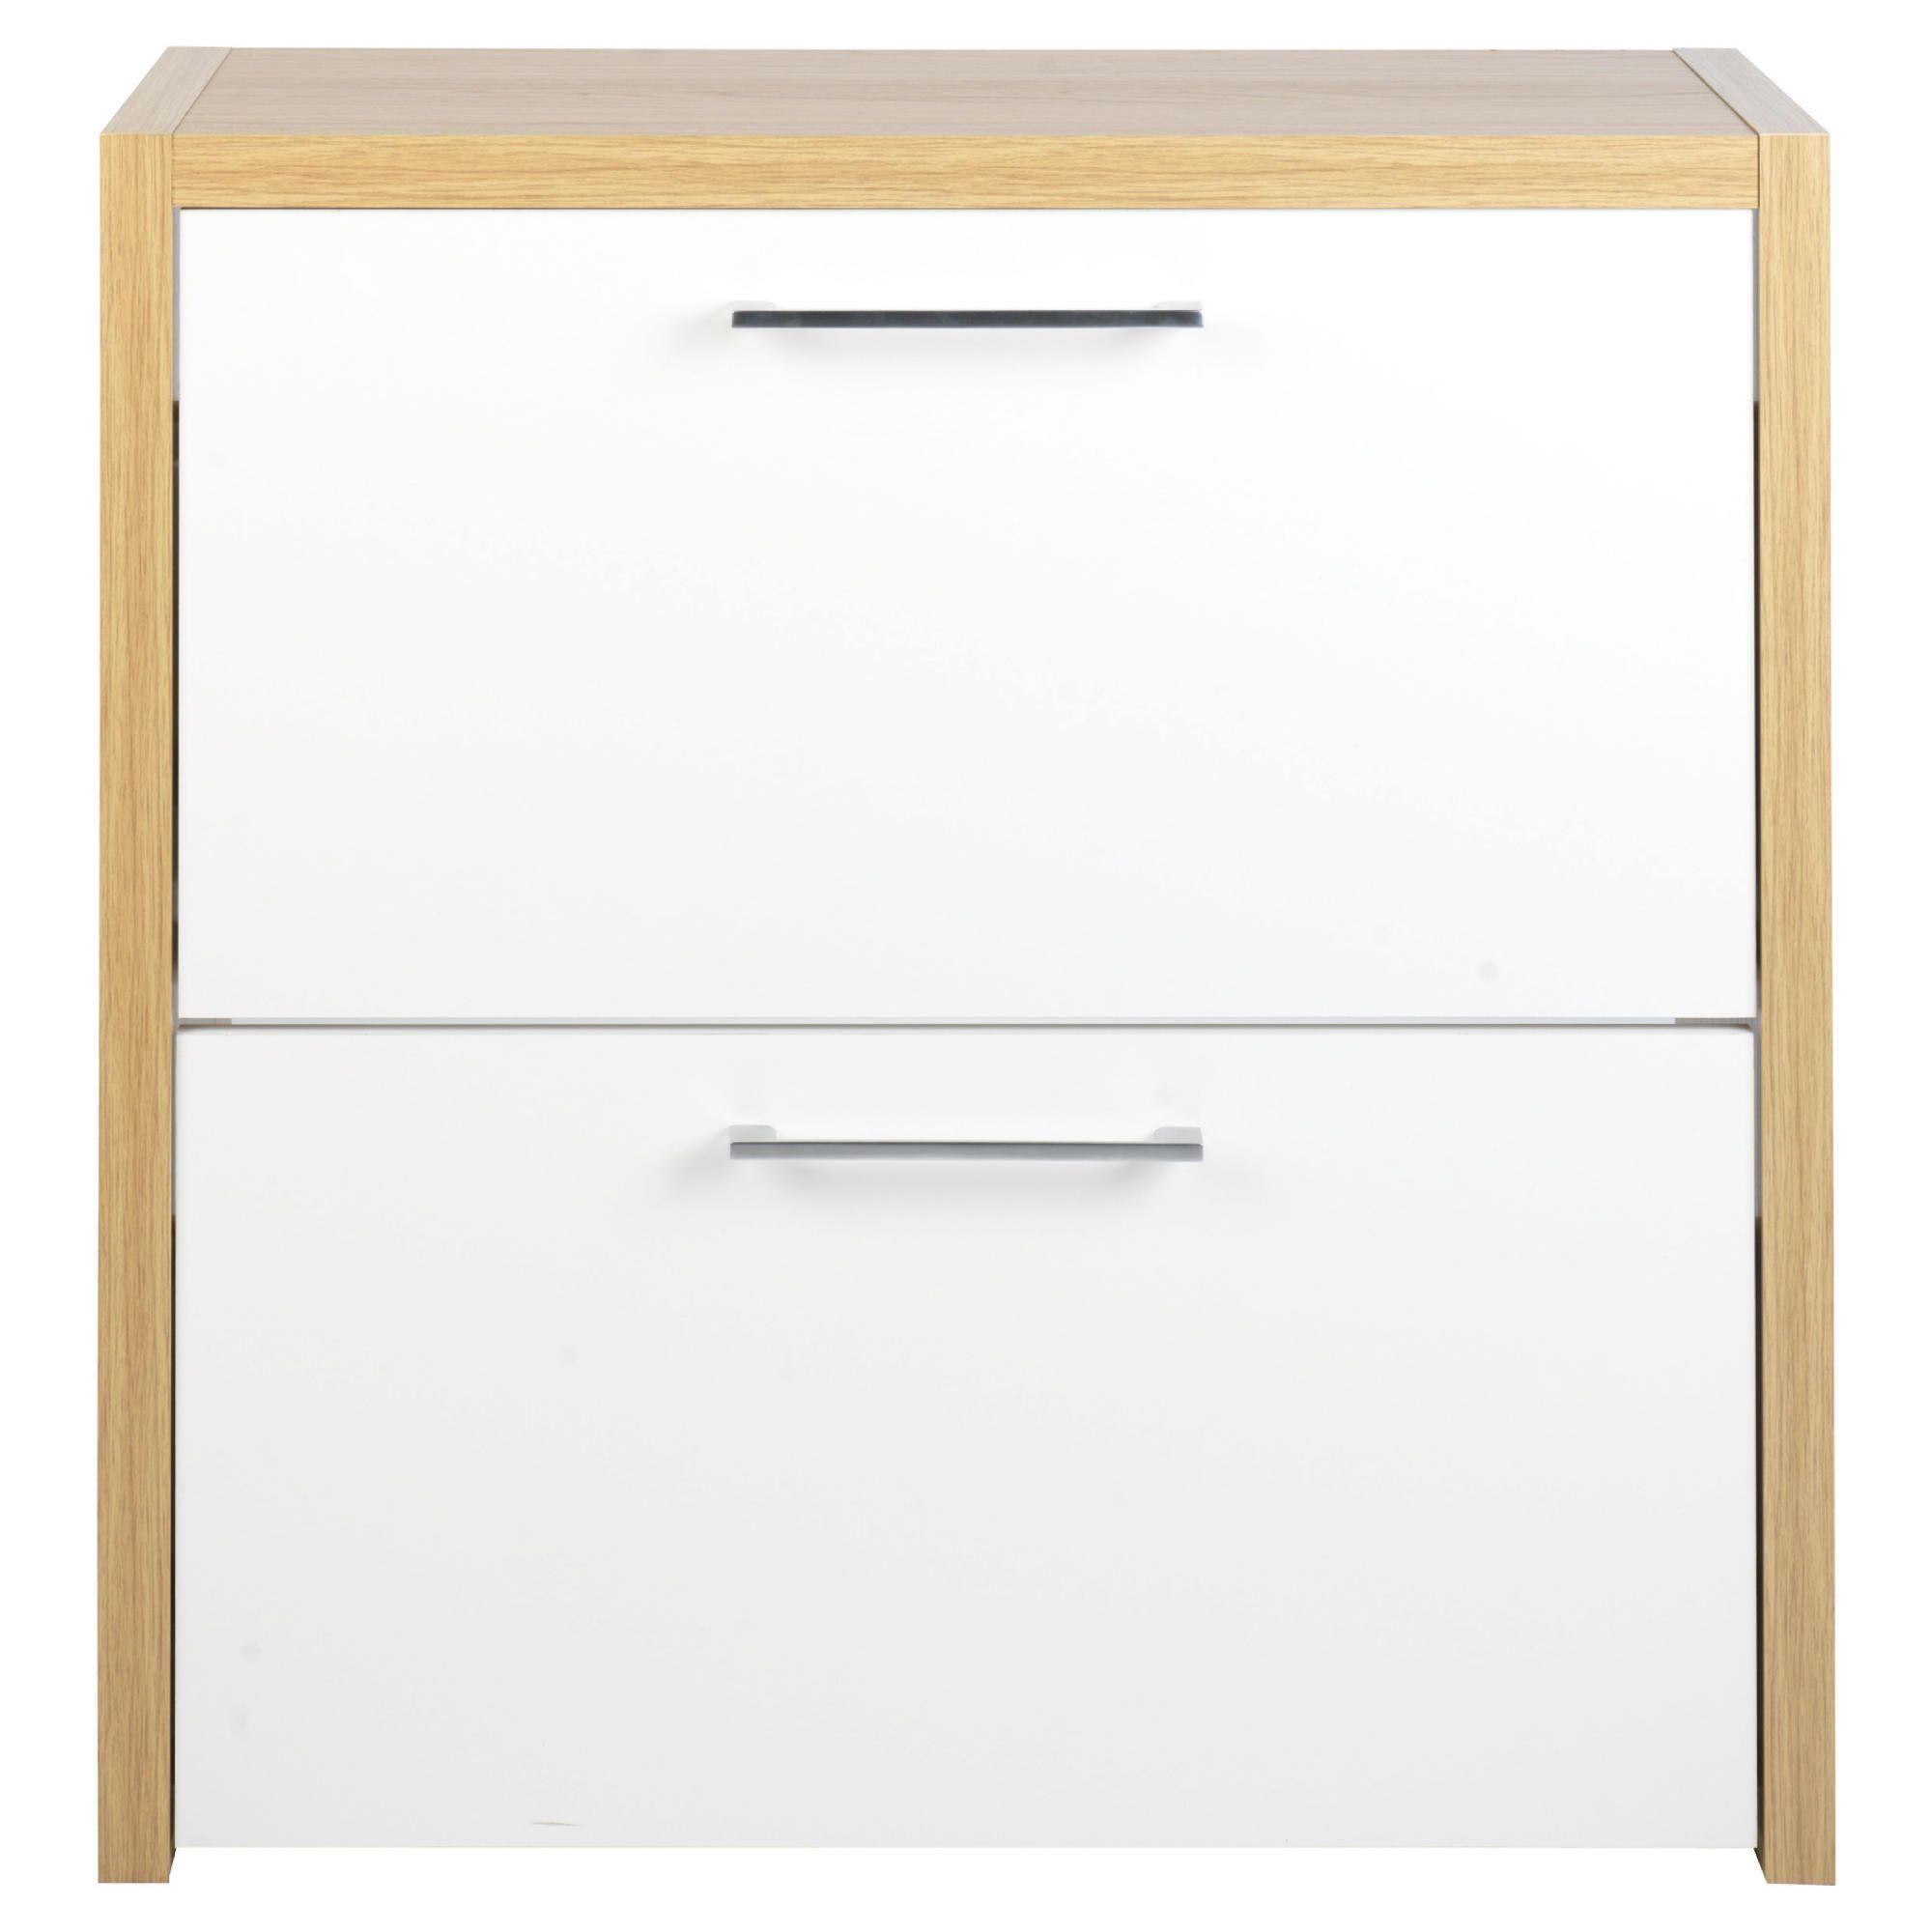 tesco manhattan shoe storage oak effect white gloss. Black Bedroom Furniture Sets. Home Design Ideas